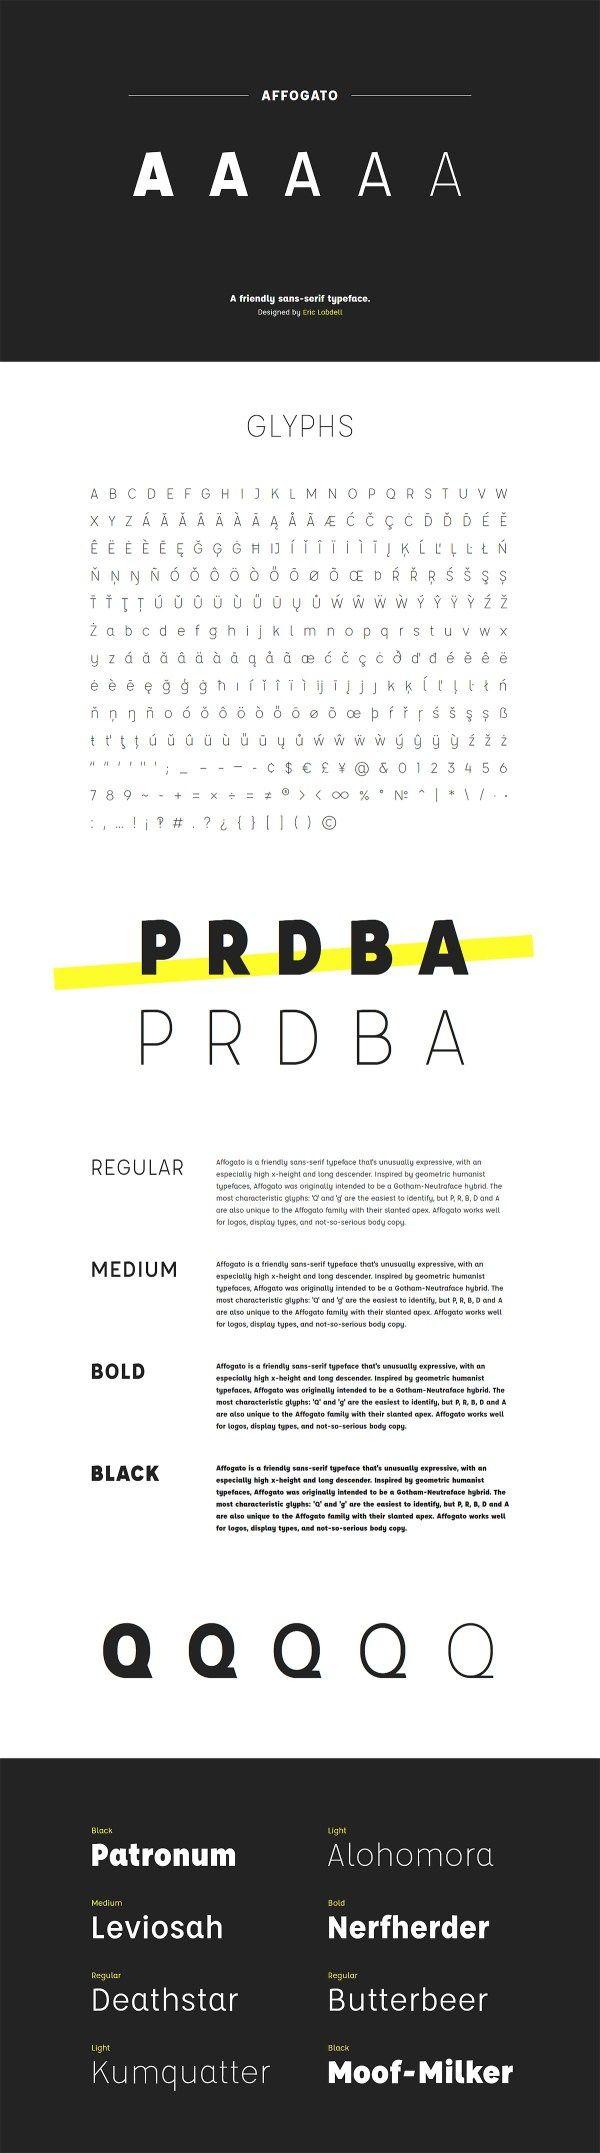 Affogato Free Sans Serif Typeface Sans Serif Typeface Typeface Typography Fonts